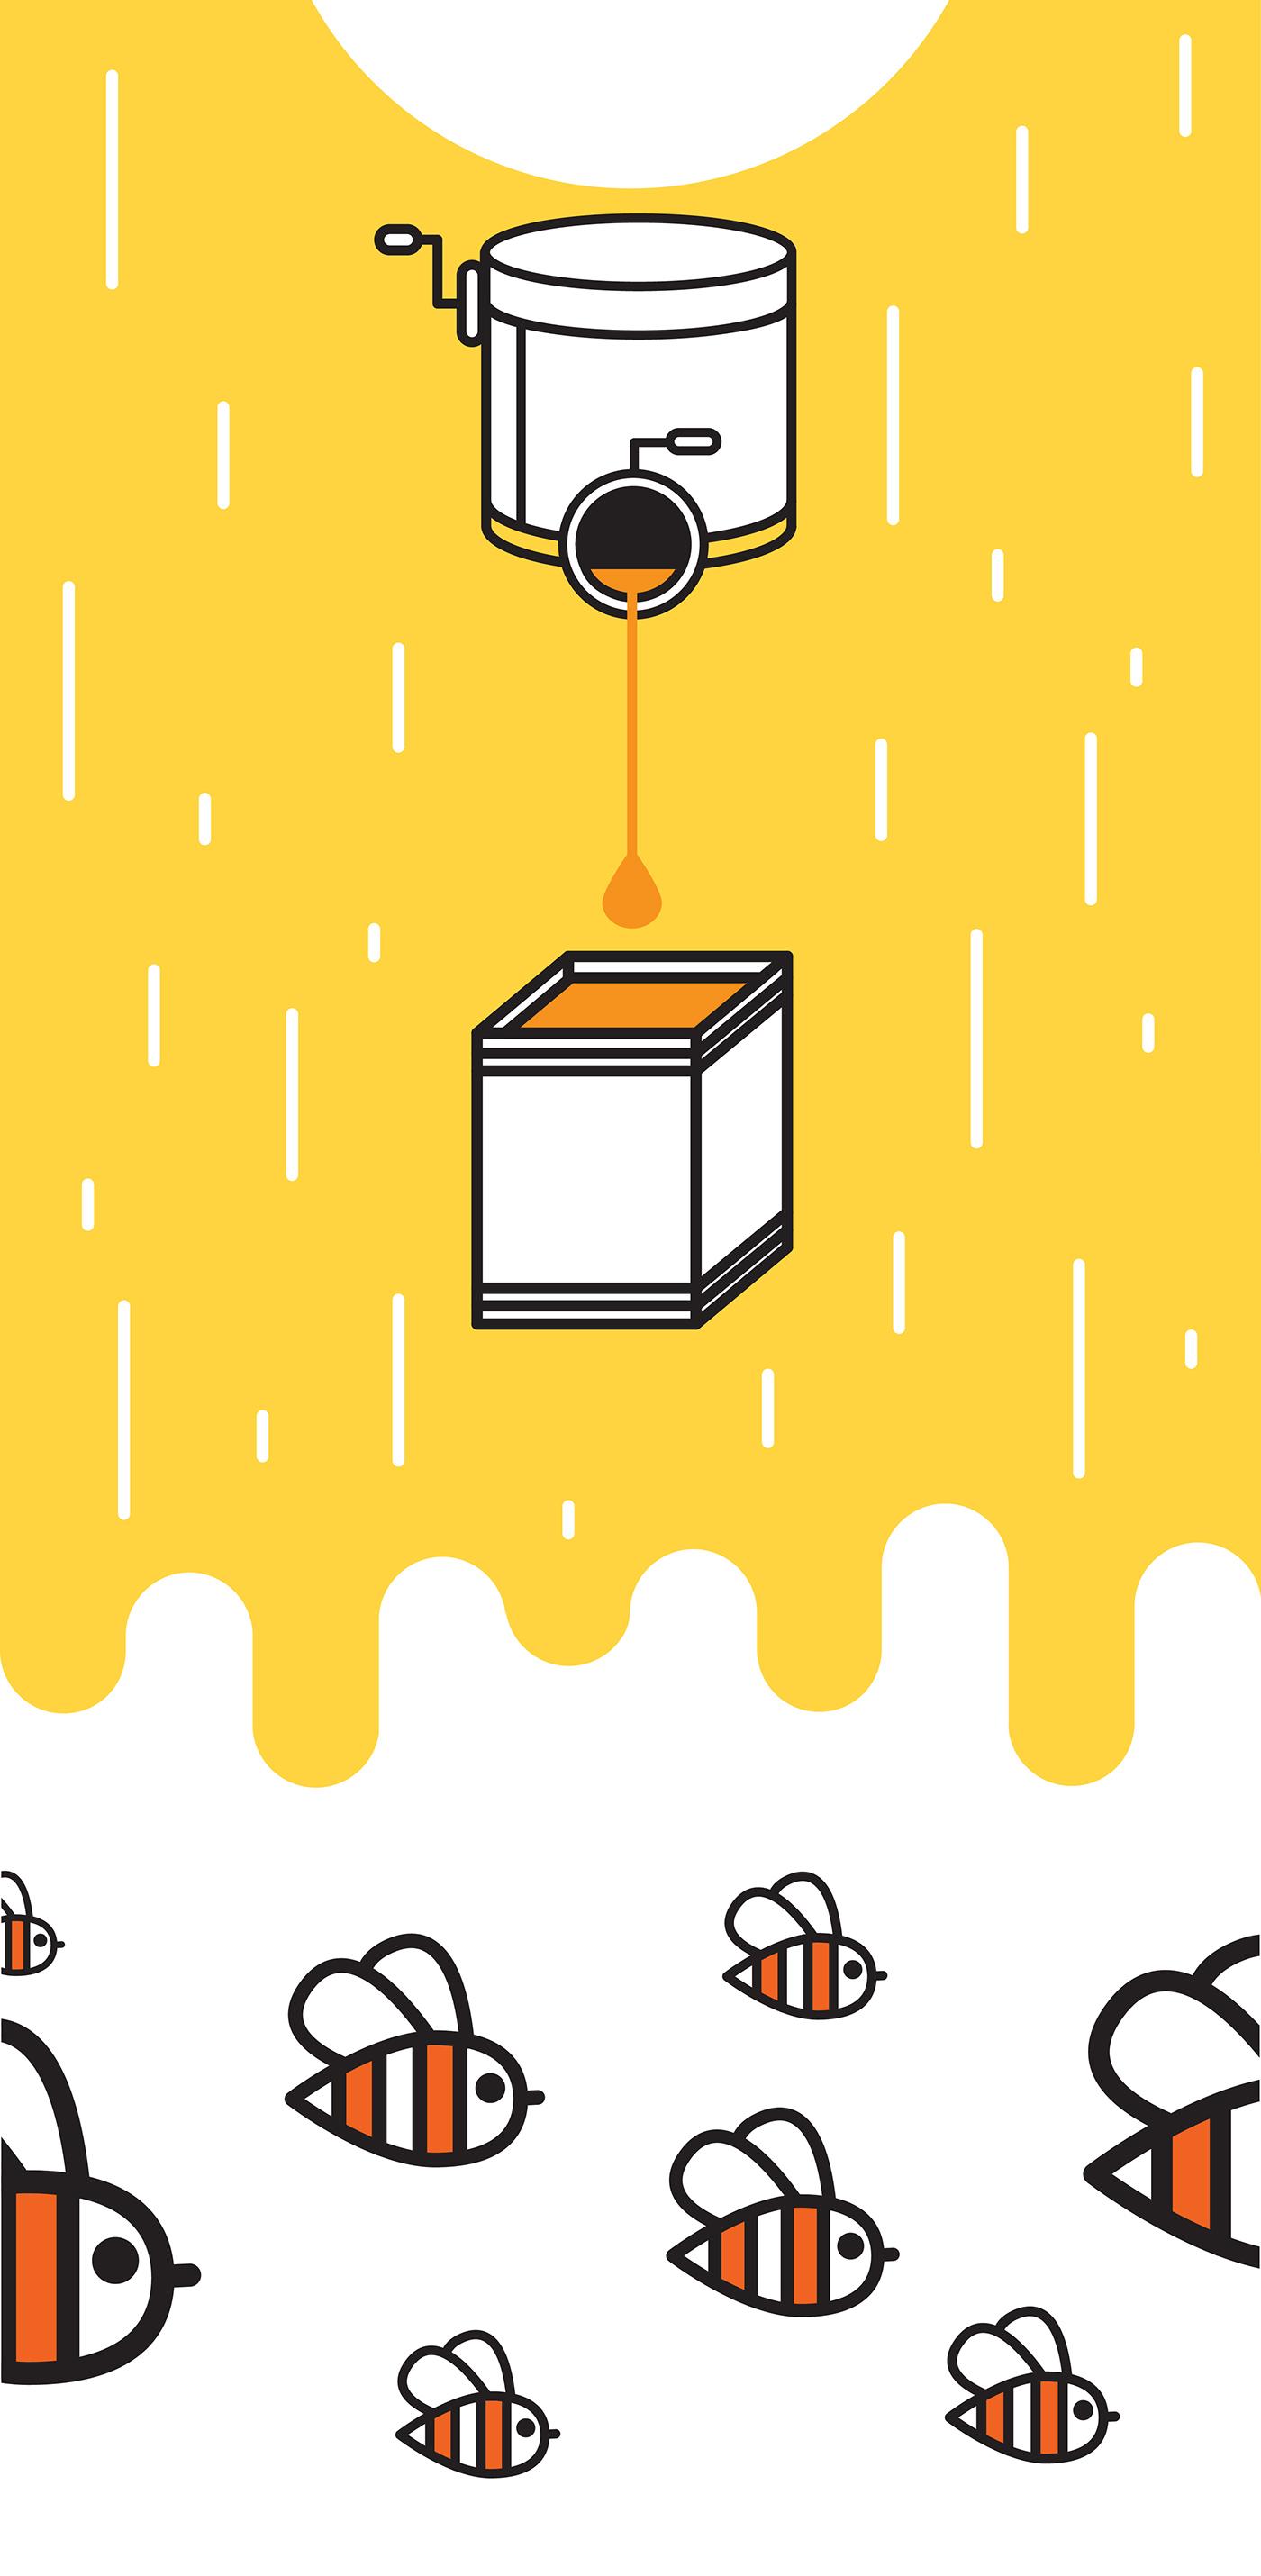 Balparmak honey bee bal 2D Animation